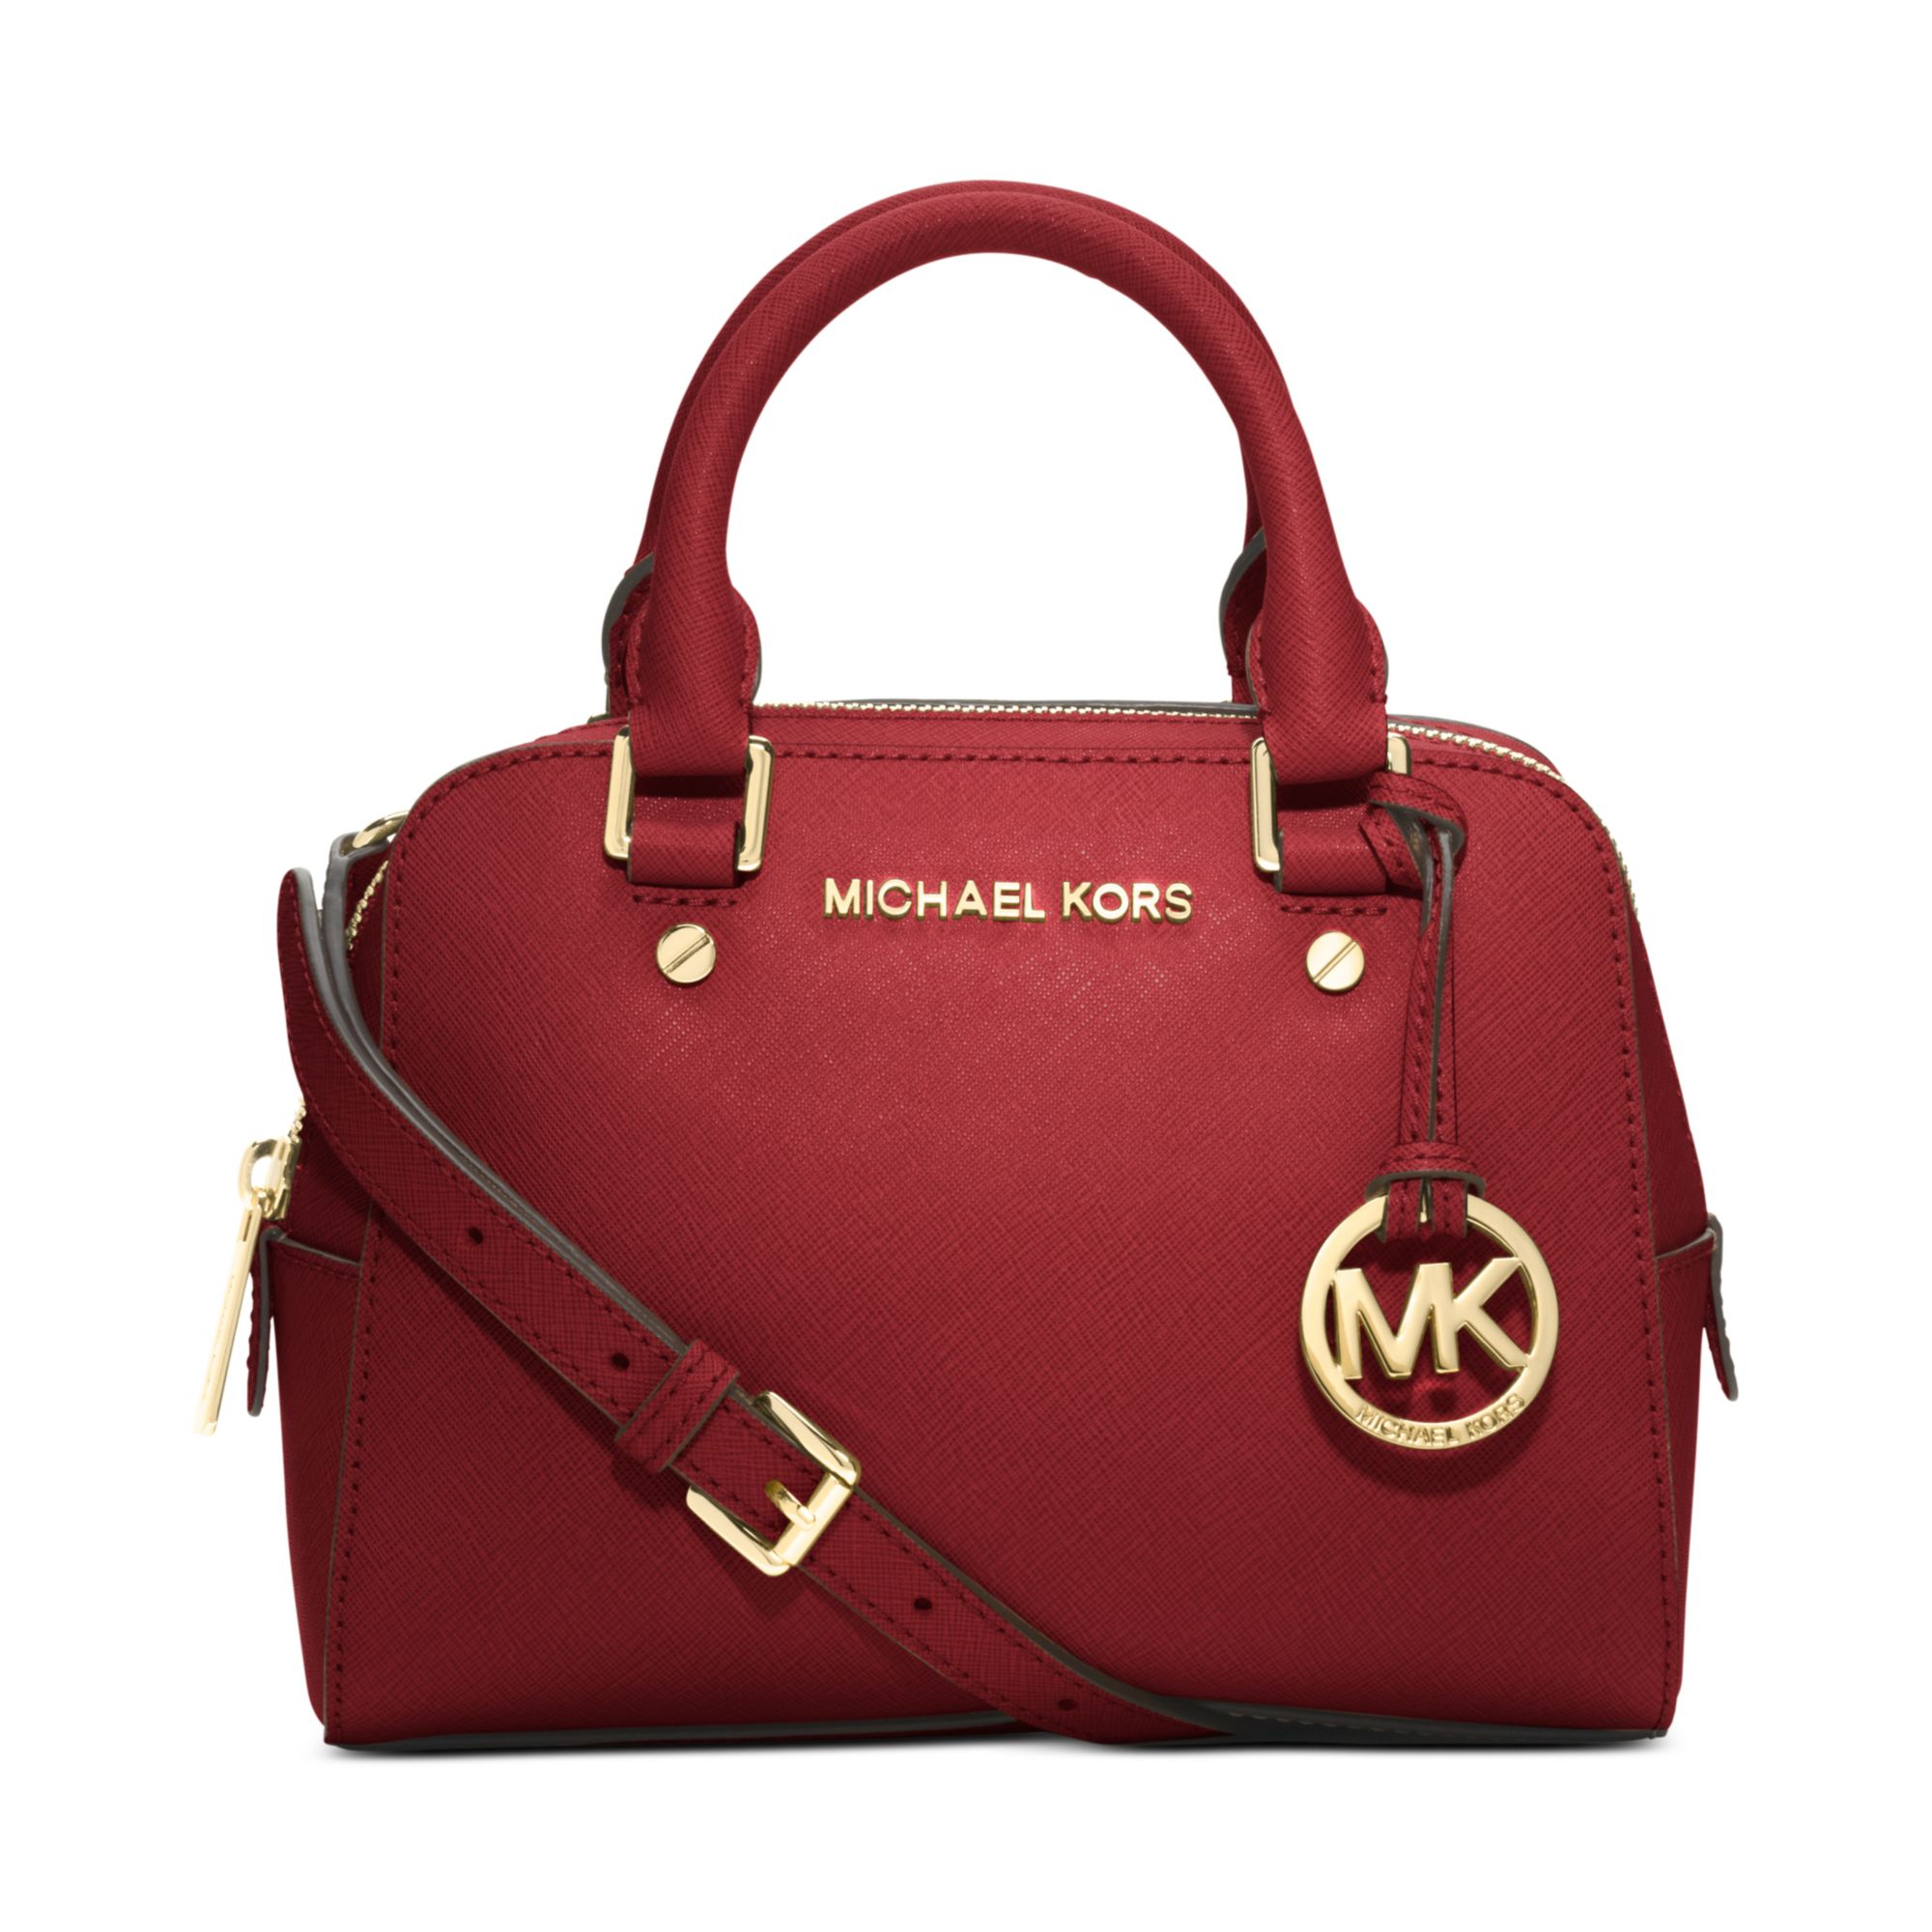 michael kors jet set small travel satchel in red lyst. Black Bedroom Furniture Sets. Home Design Ideas